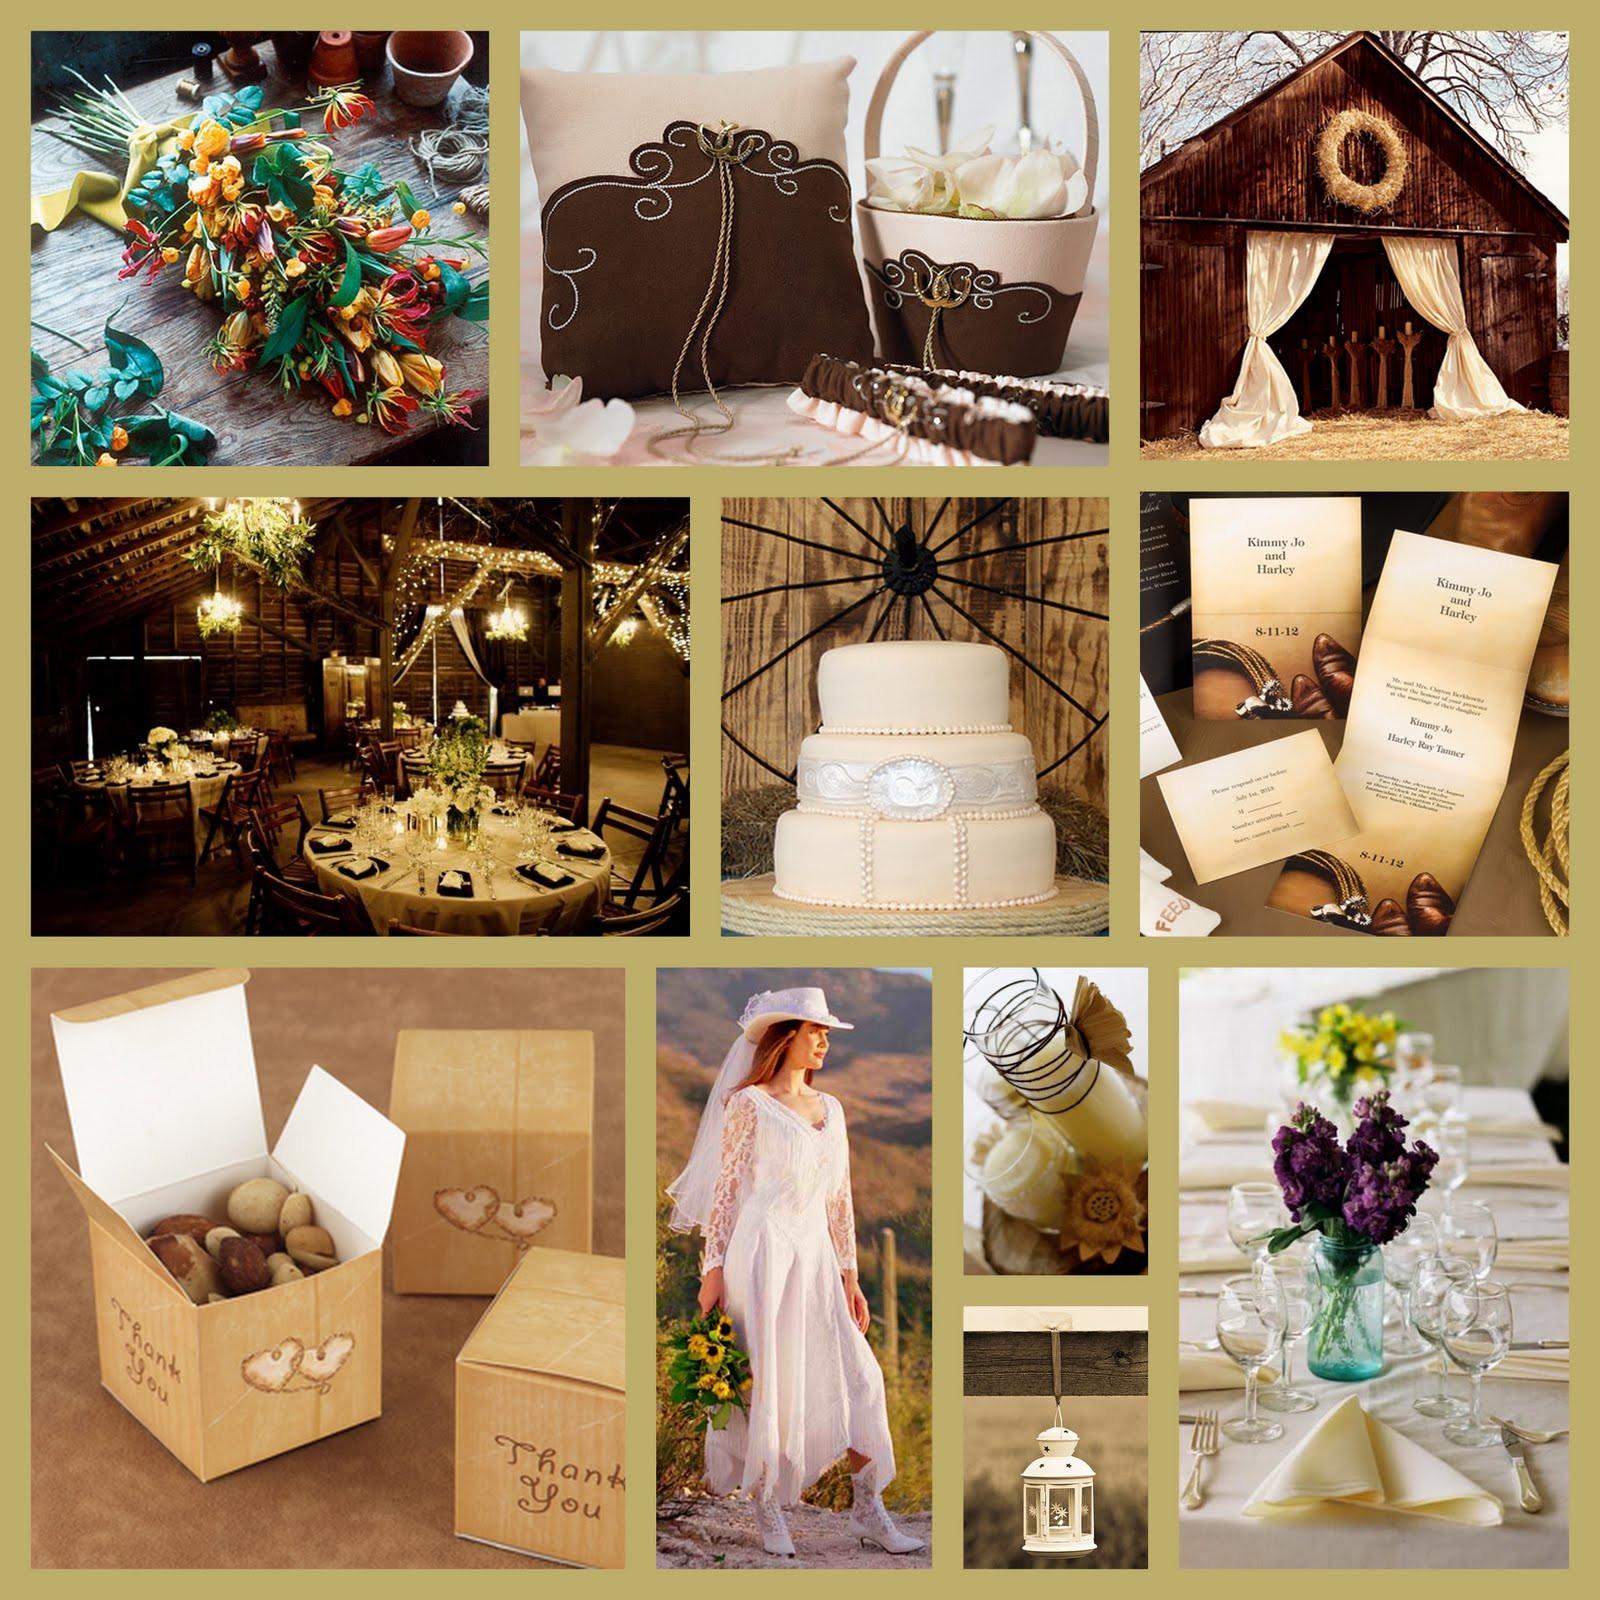 Country Themed Wedding Favors  Premier Bride Magazine Texas Wedding Theme Western